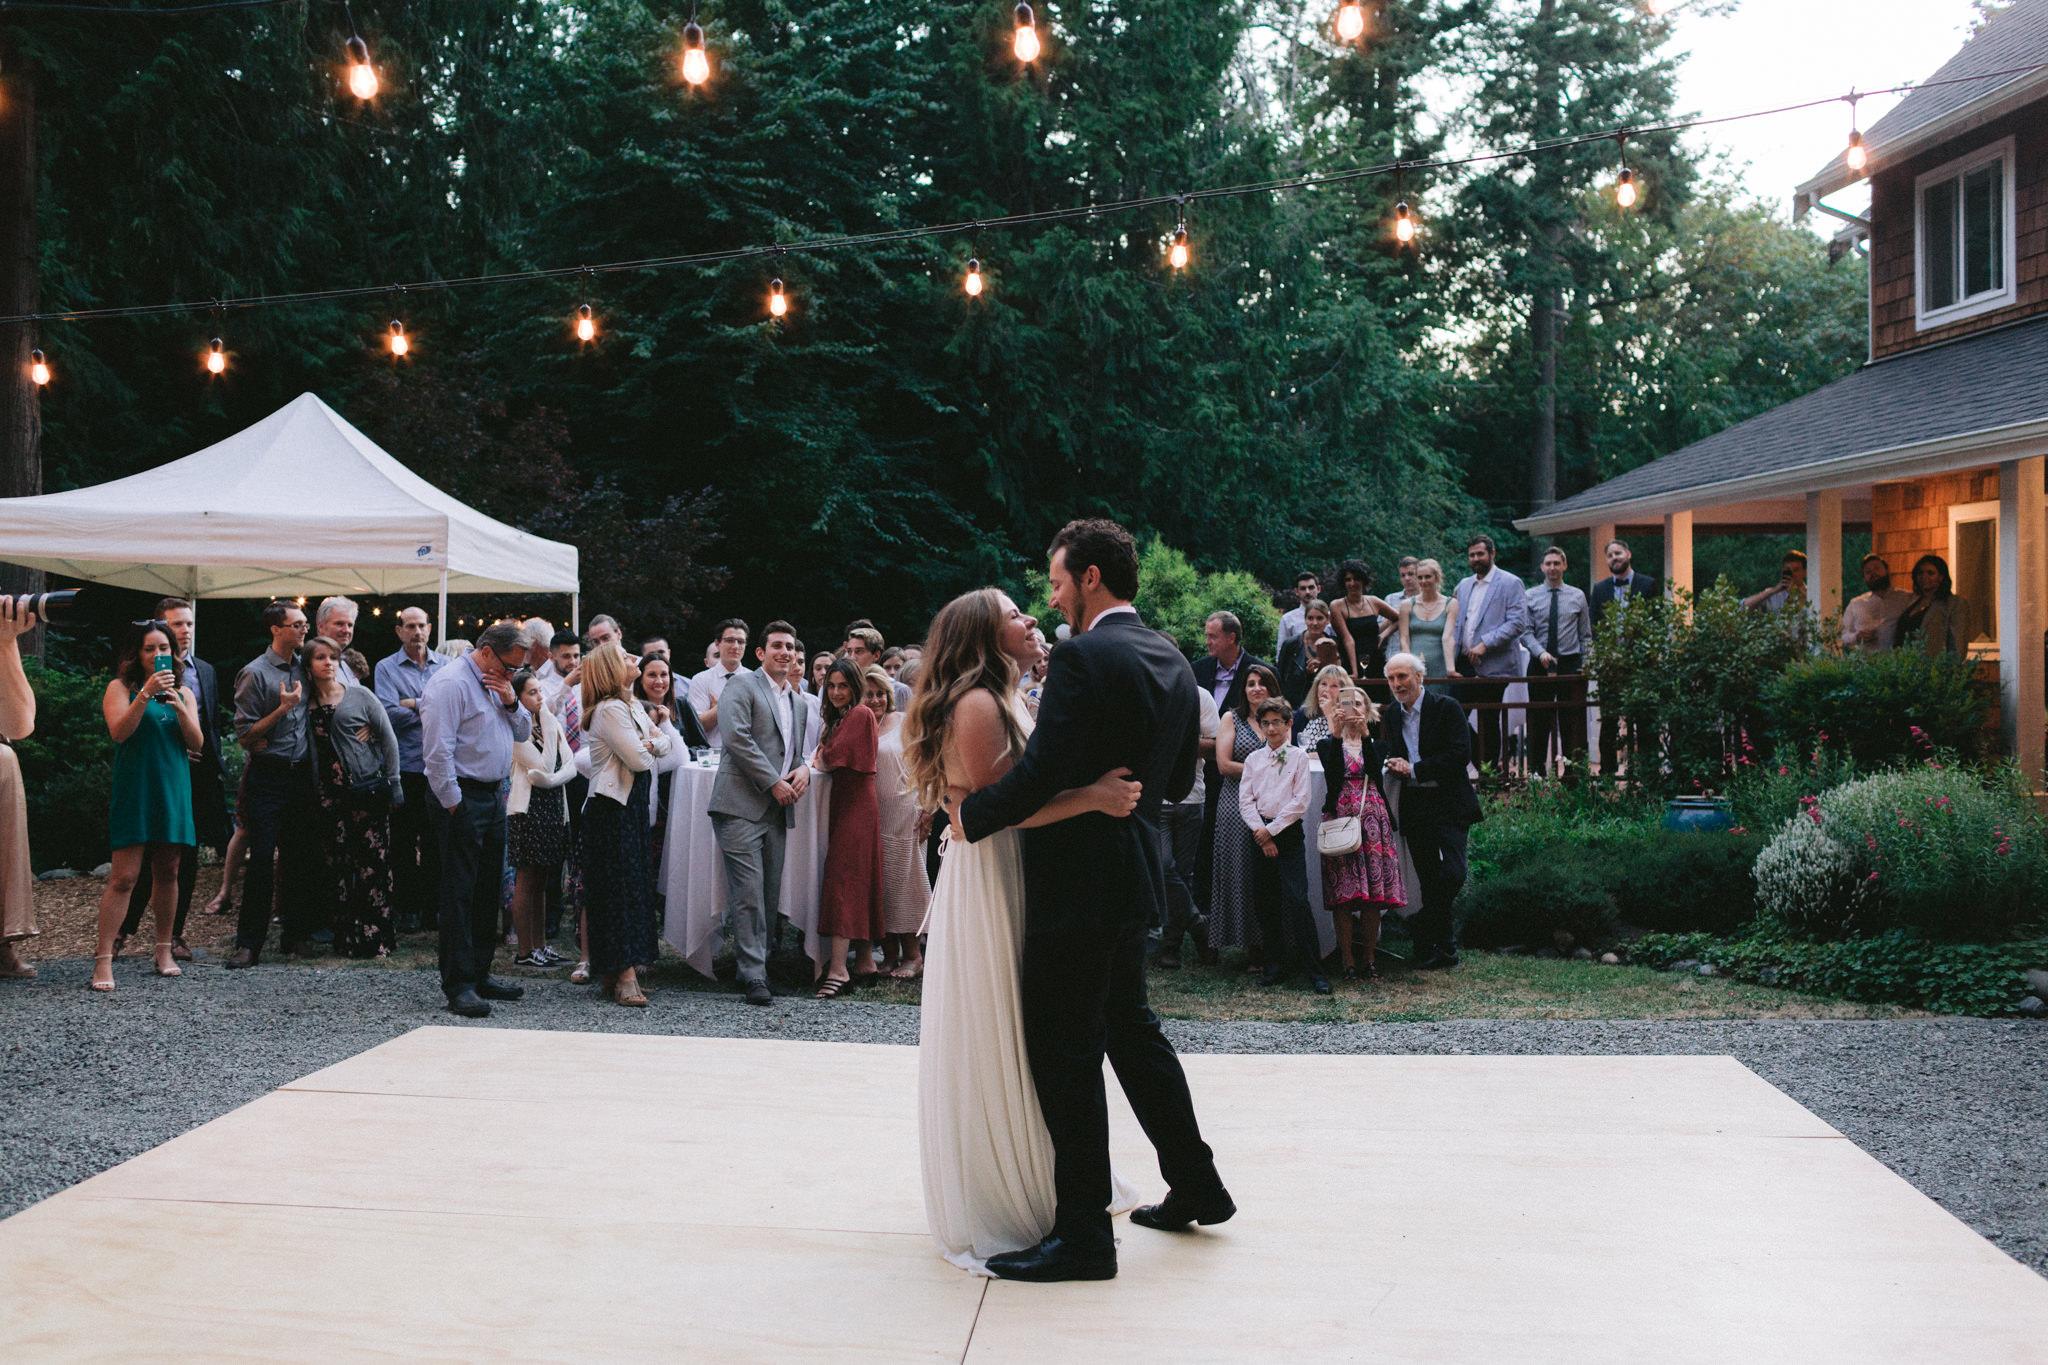 Backyard-Bainbridge-Island-Wedding-Alycia-Lovell-Photography-222.JPG